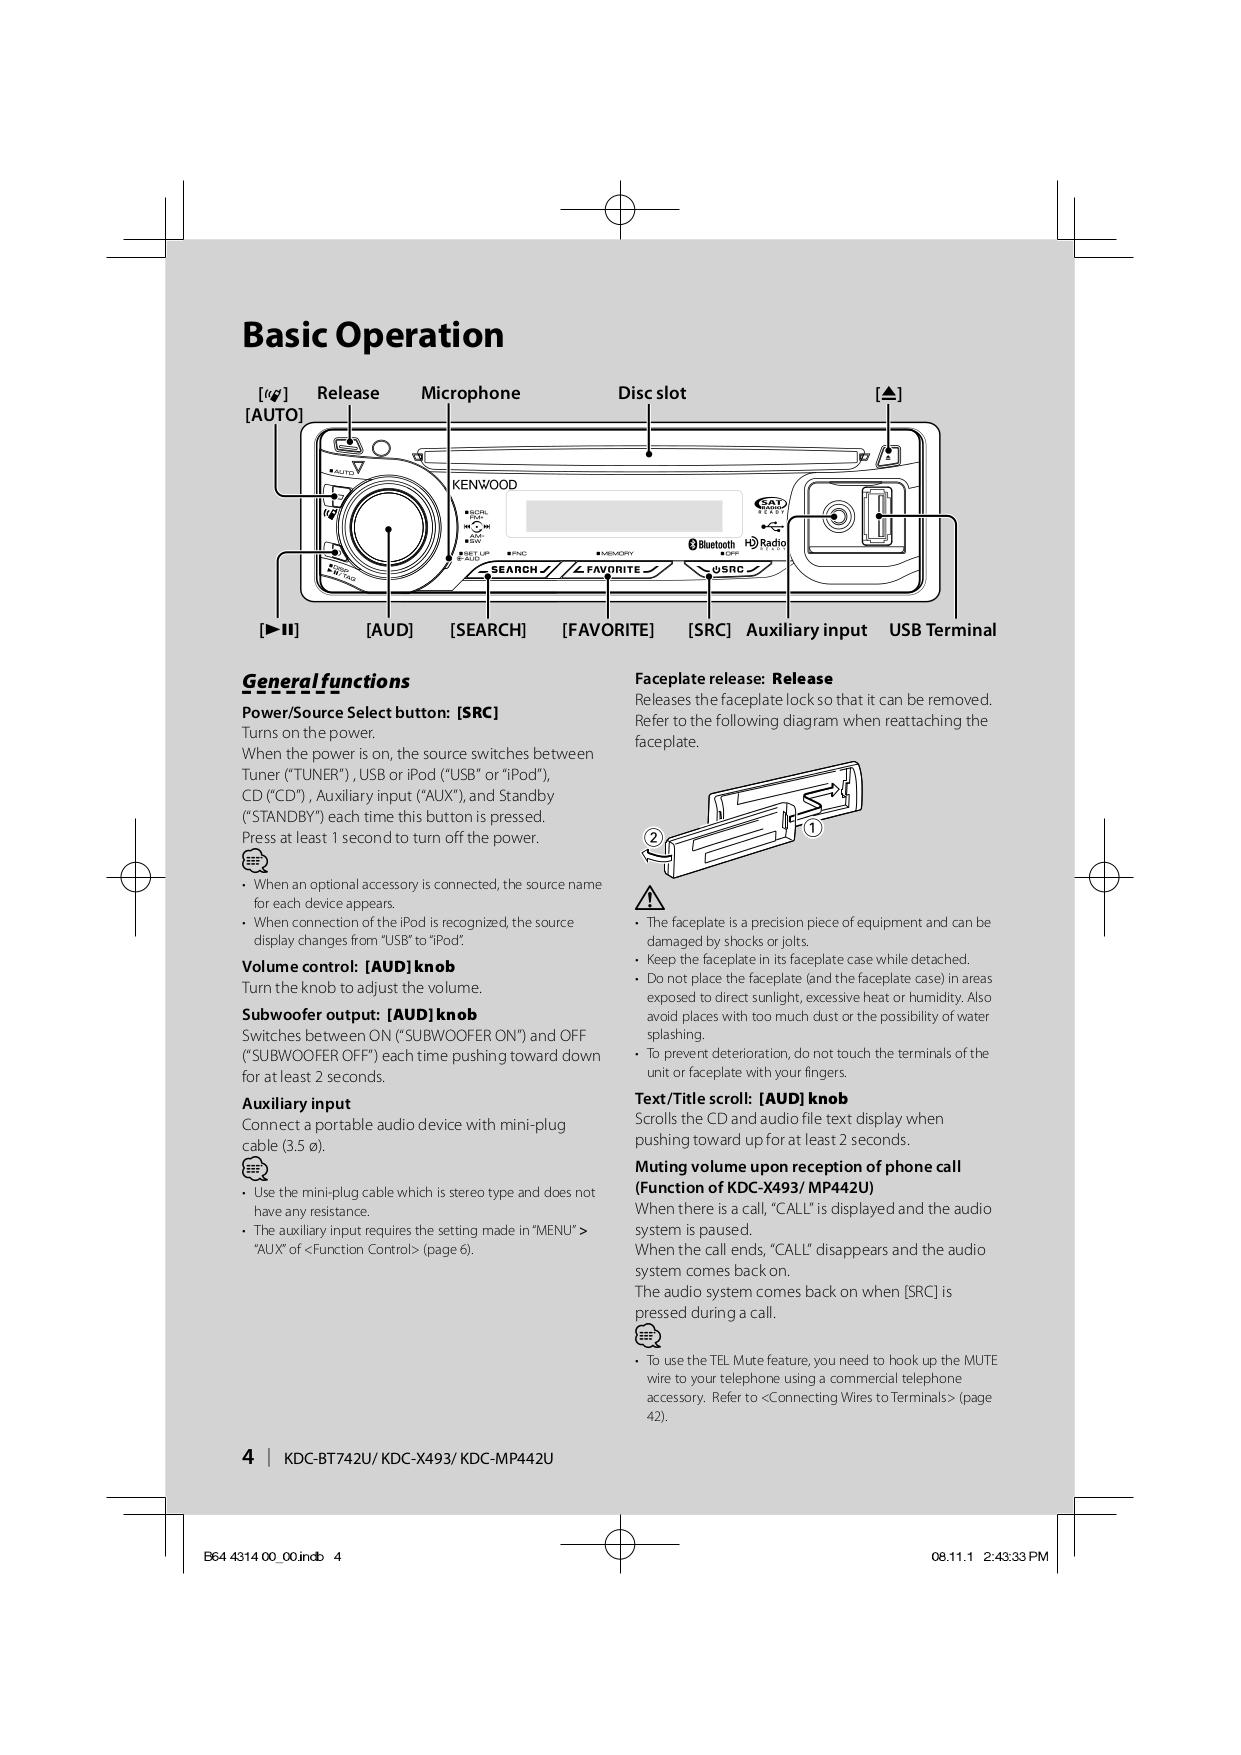 Kdc X493 Manual Wiring Diagram Kenwood Mp442u Array Pdf For Car Receiver 135 Rh Umlib Com